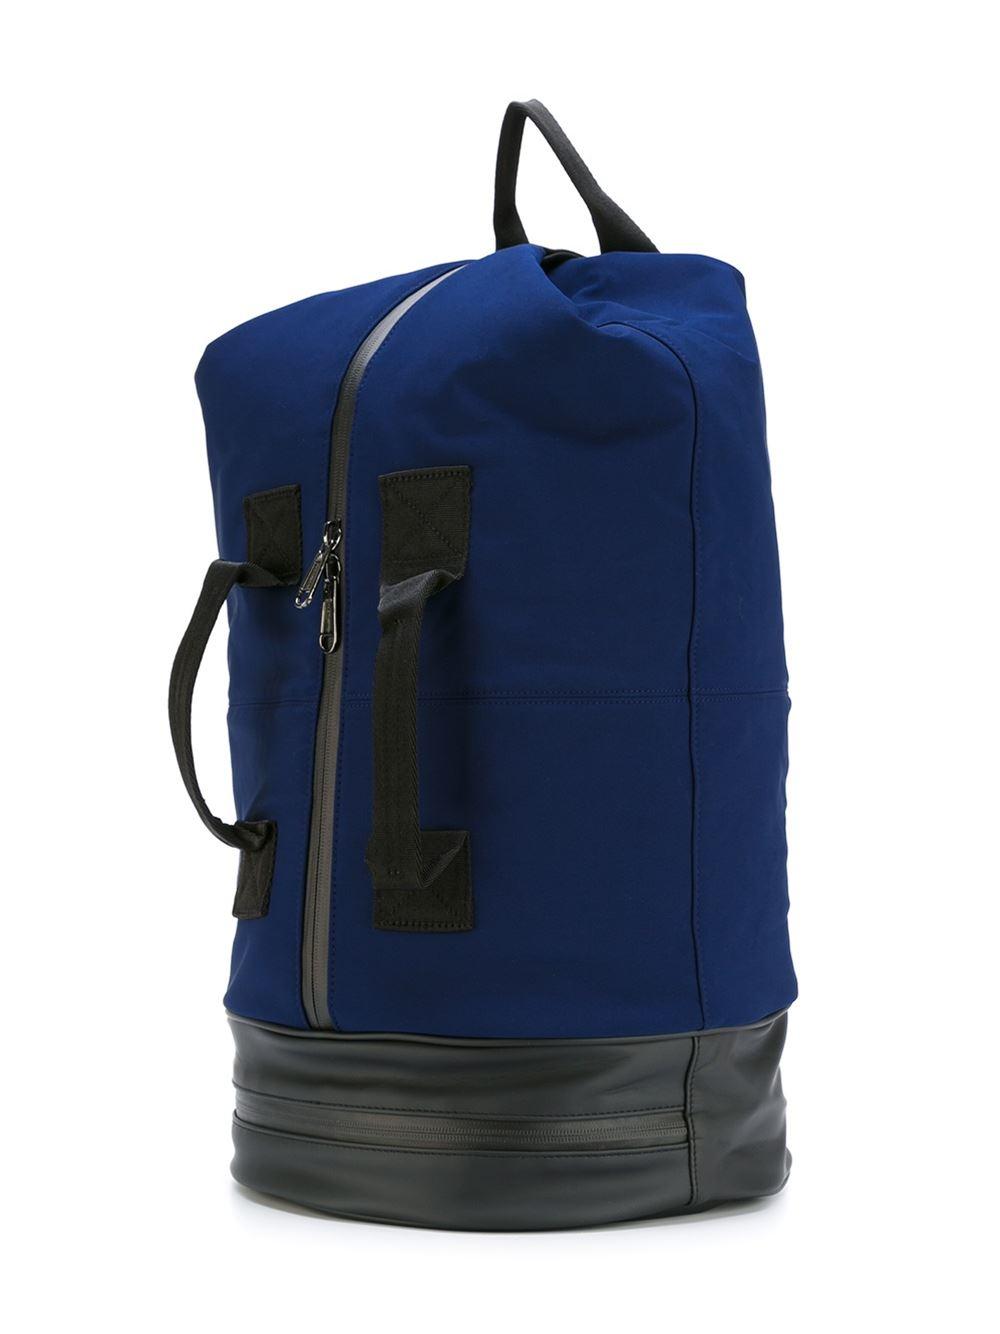 adidas by stella mccartney sports backpack in black lyst. Black Bedroom Furniture Sets. Home Design Ideas